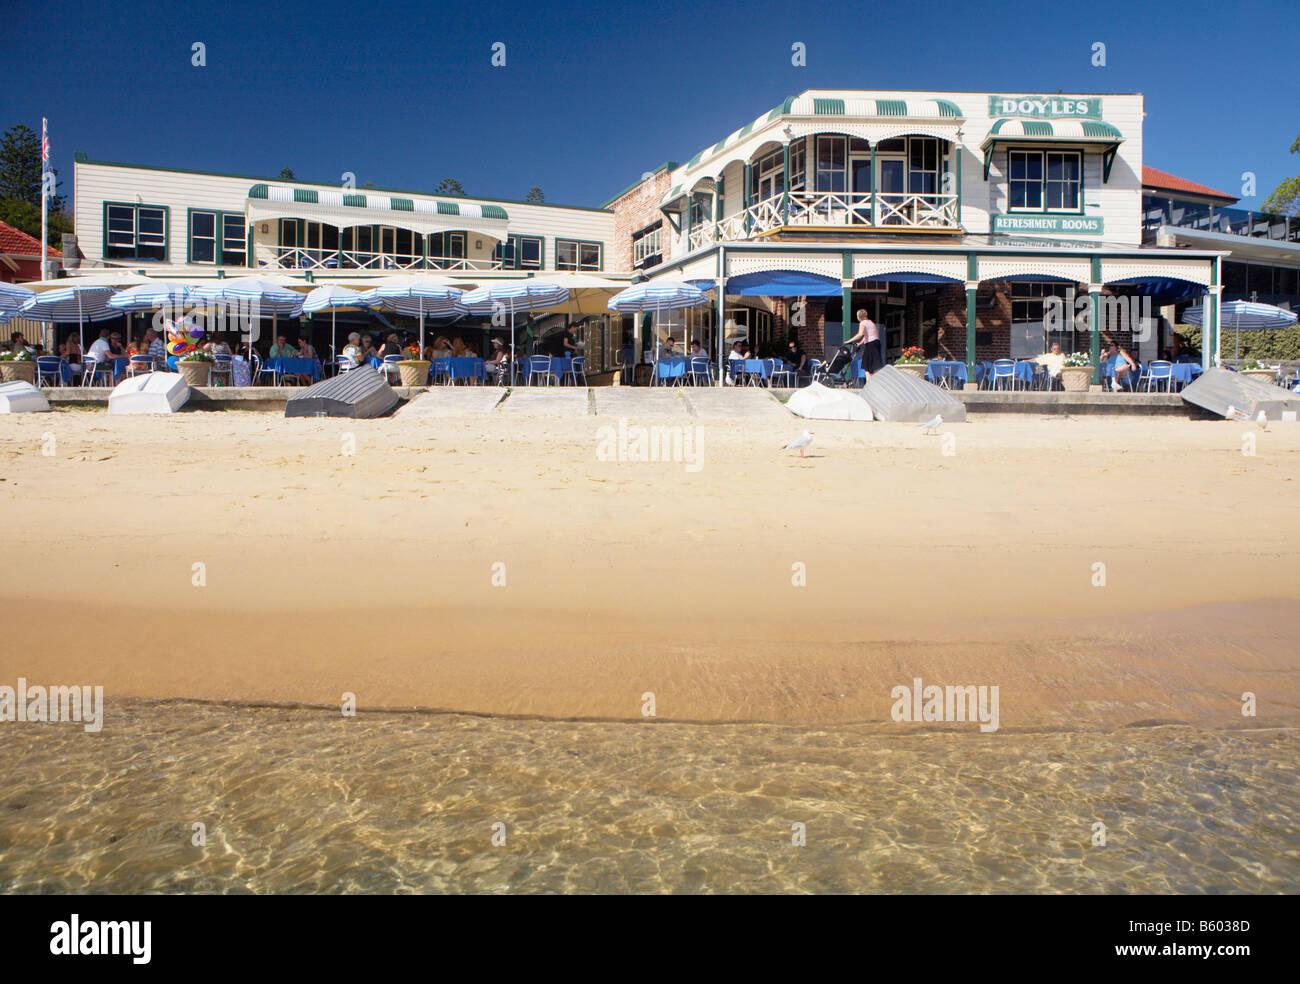 SYDNEY WATSONS BAY DOYLES - Stock Image